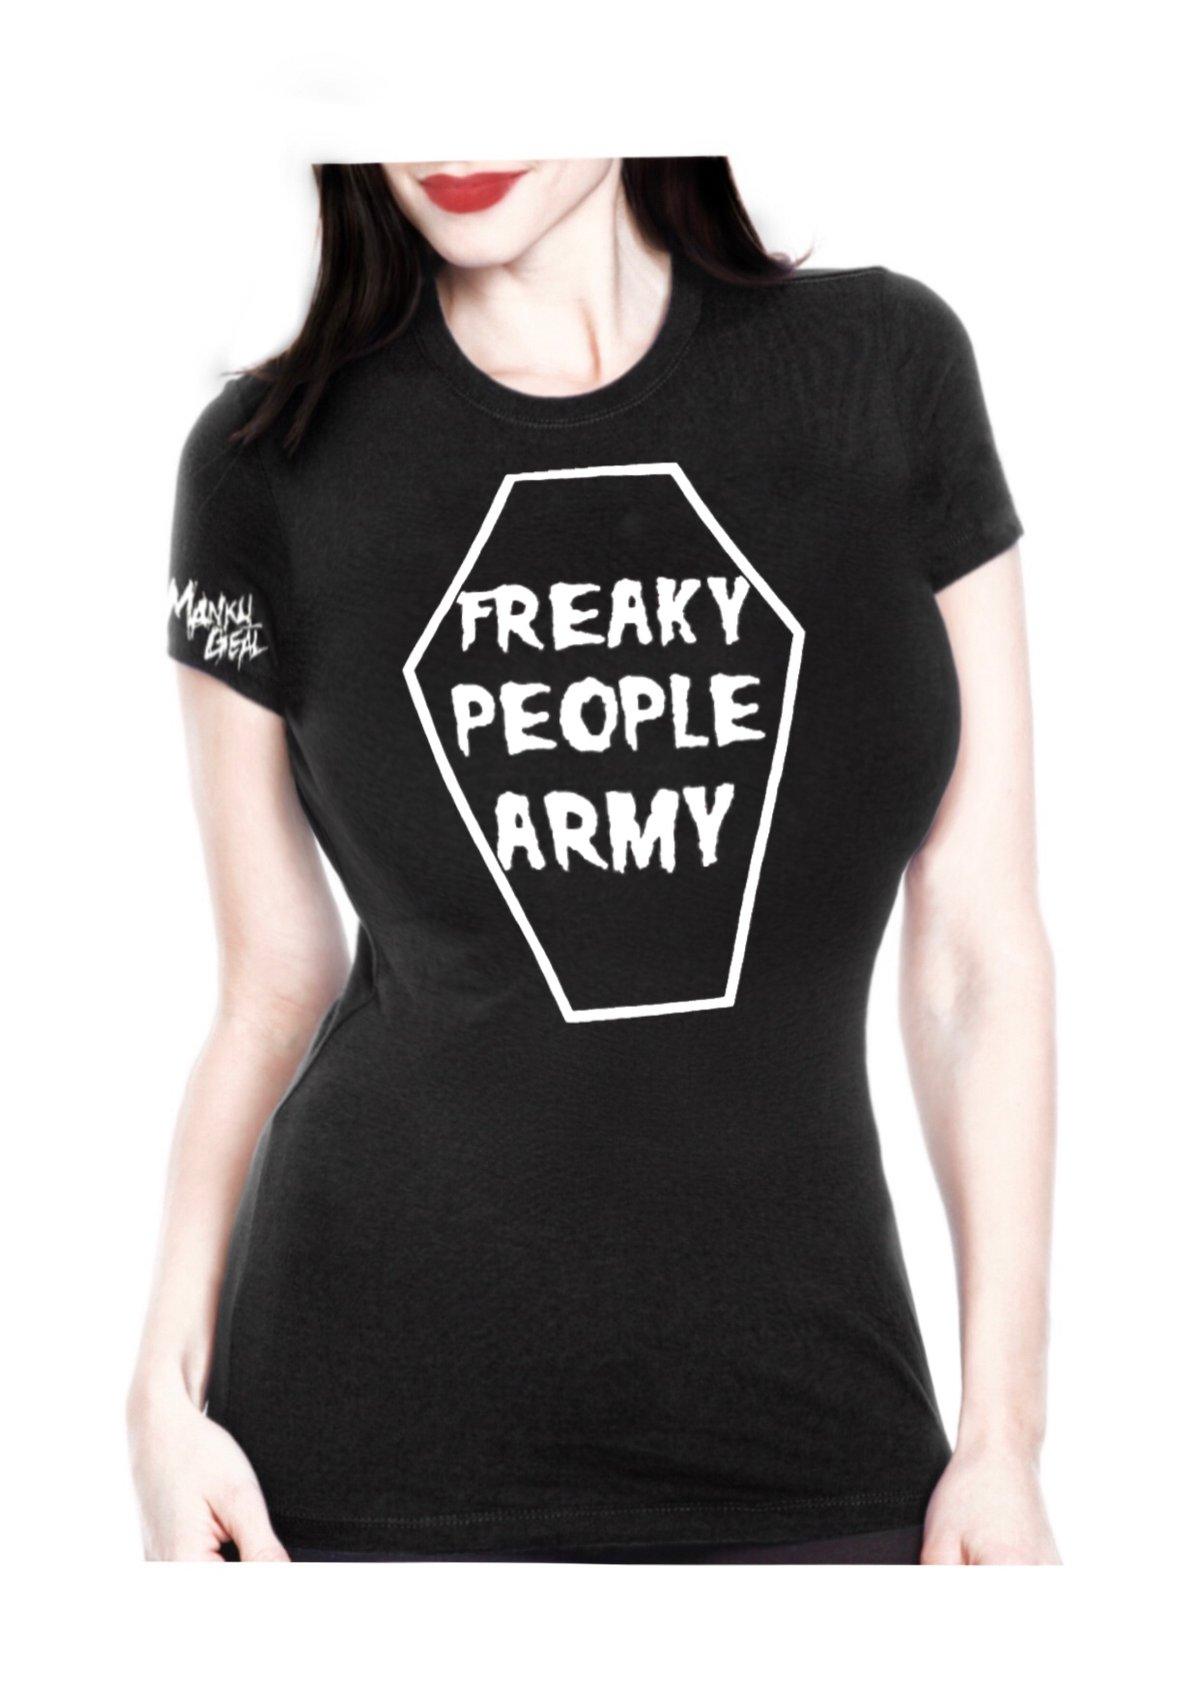 Image of Freaky People Army Women's Tee